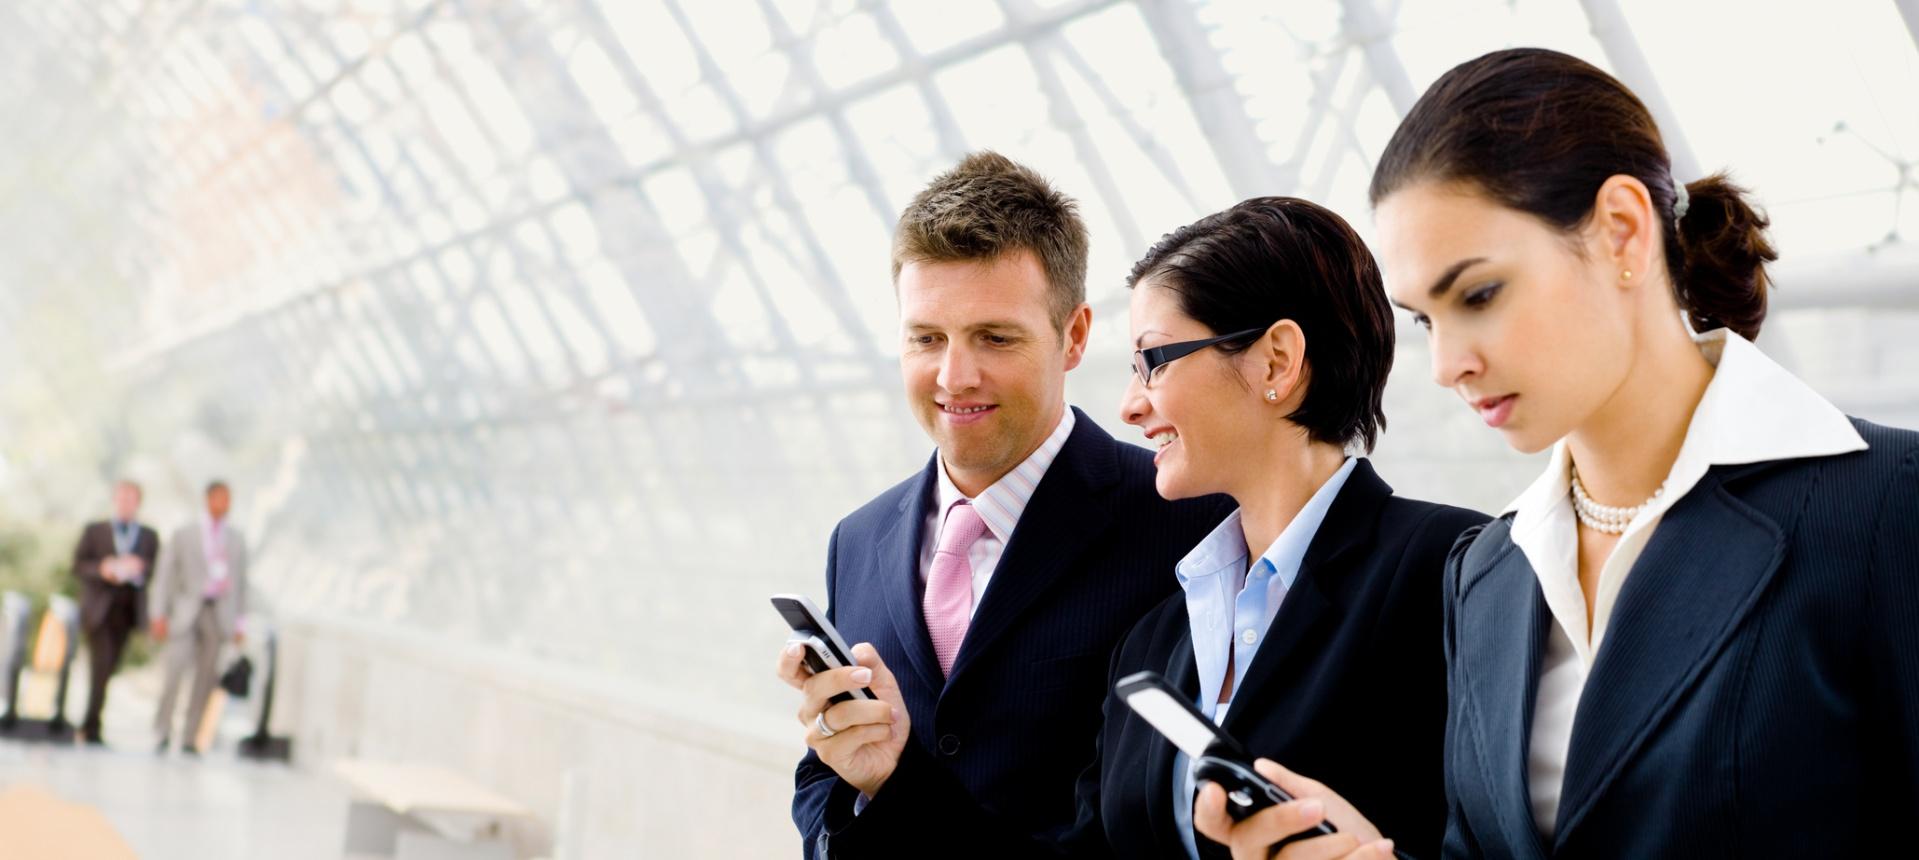 Businesspeople using mobile phone | foto prensa telco